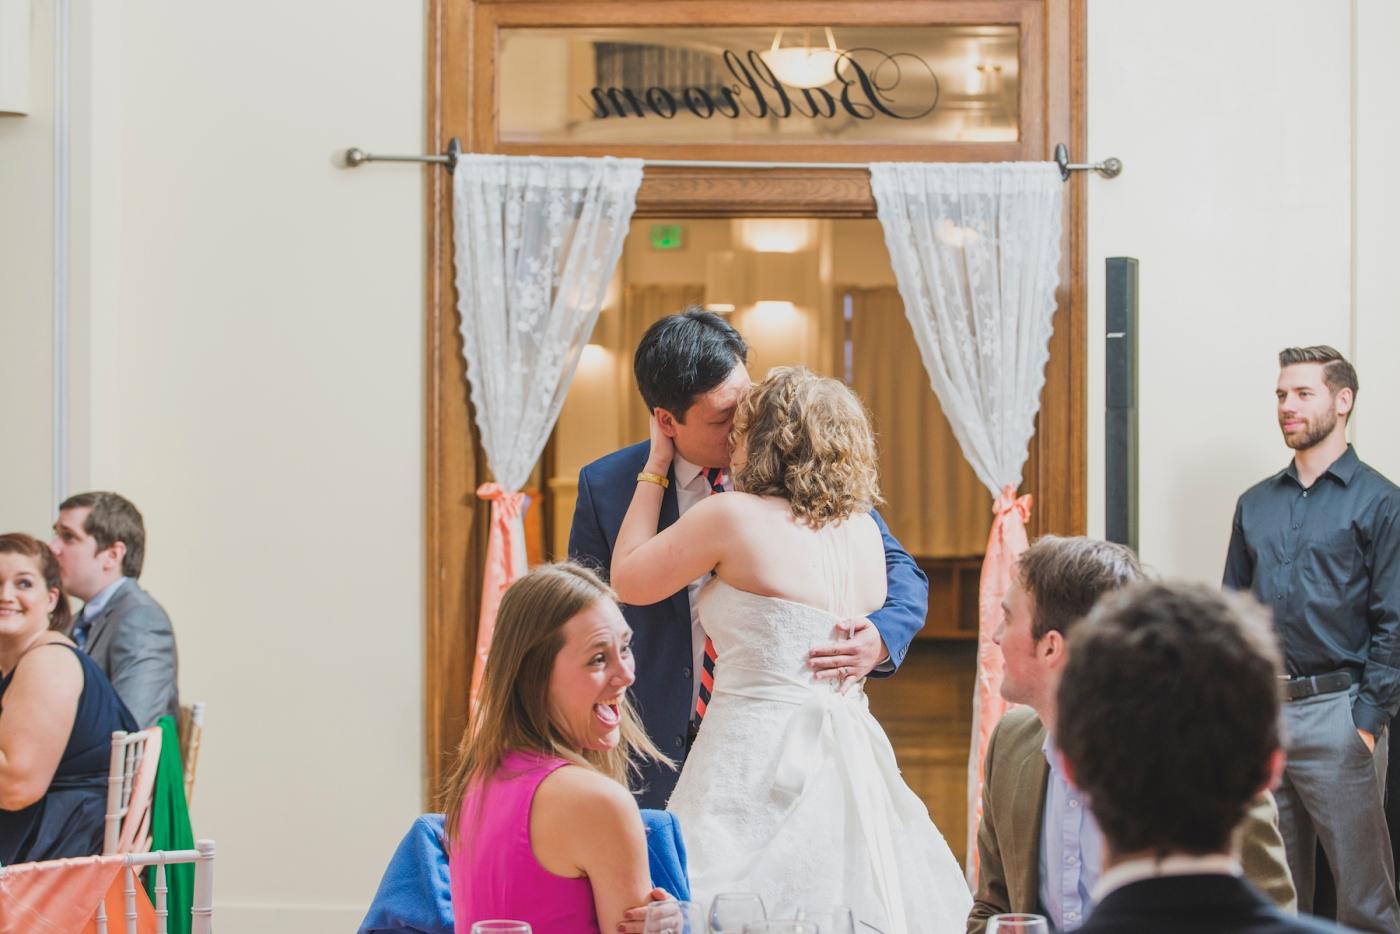 DSC_3214Everett_Wedding_Ballroom_Jane_Speleers_photography_Rachel_and_Edmund_reception_2017